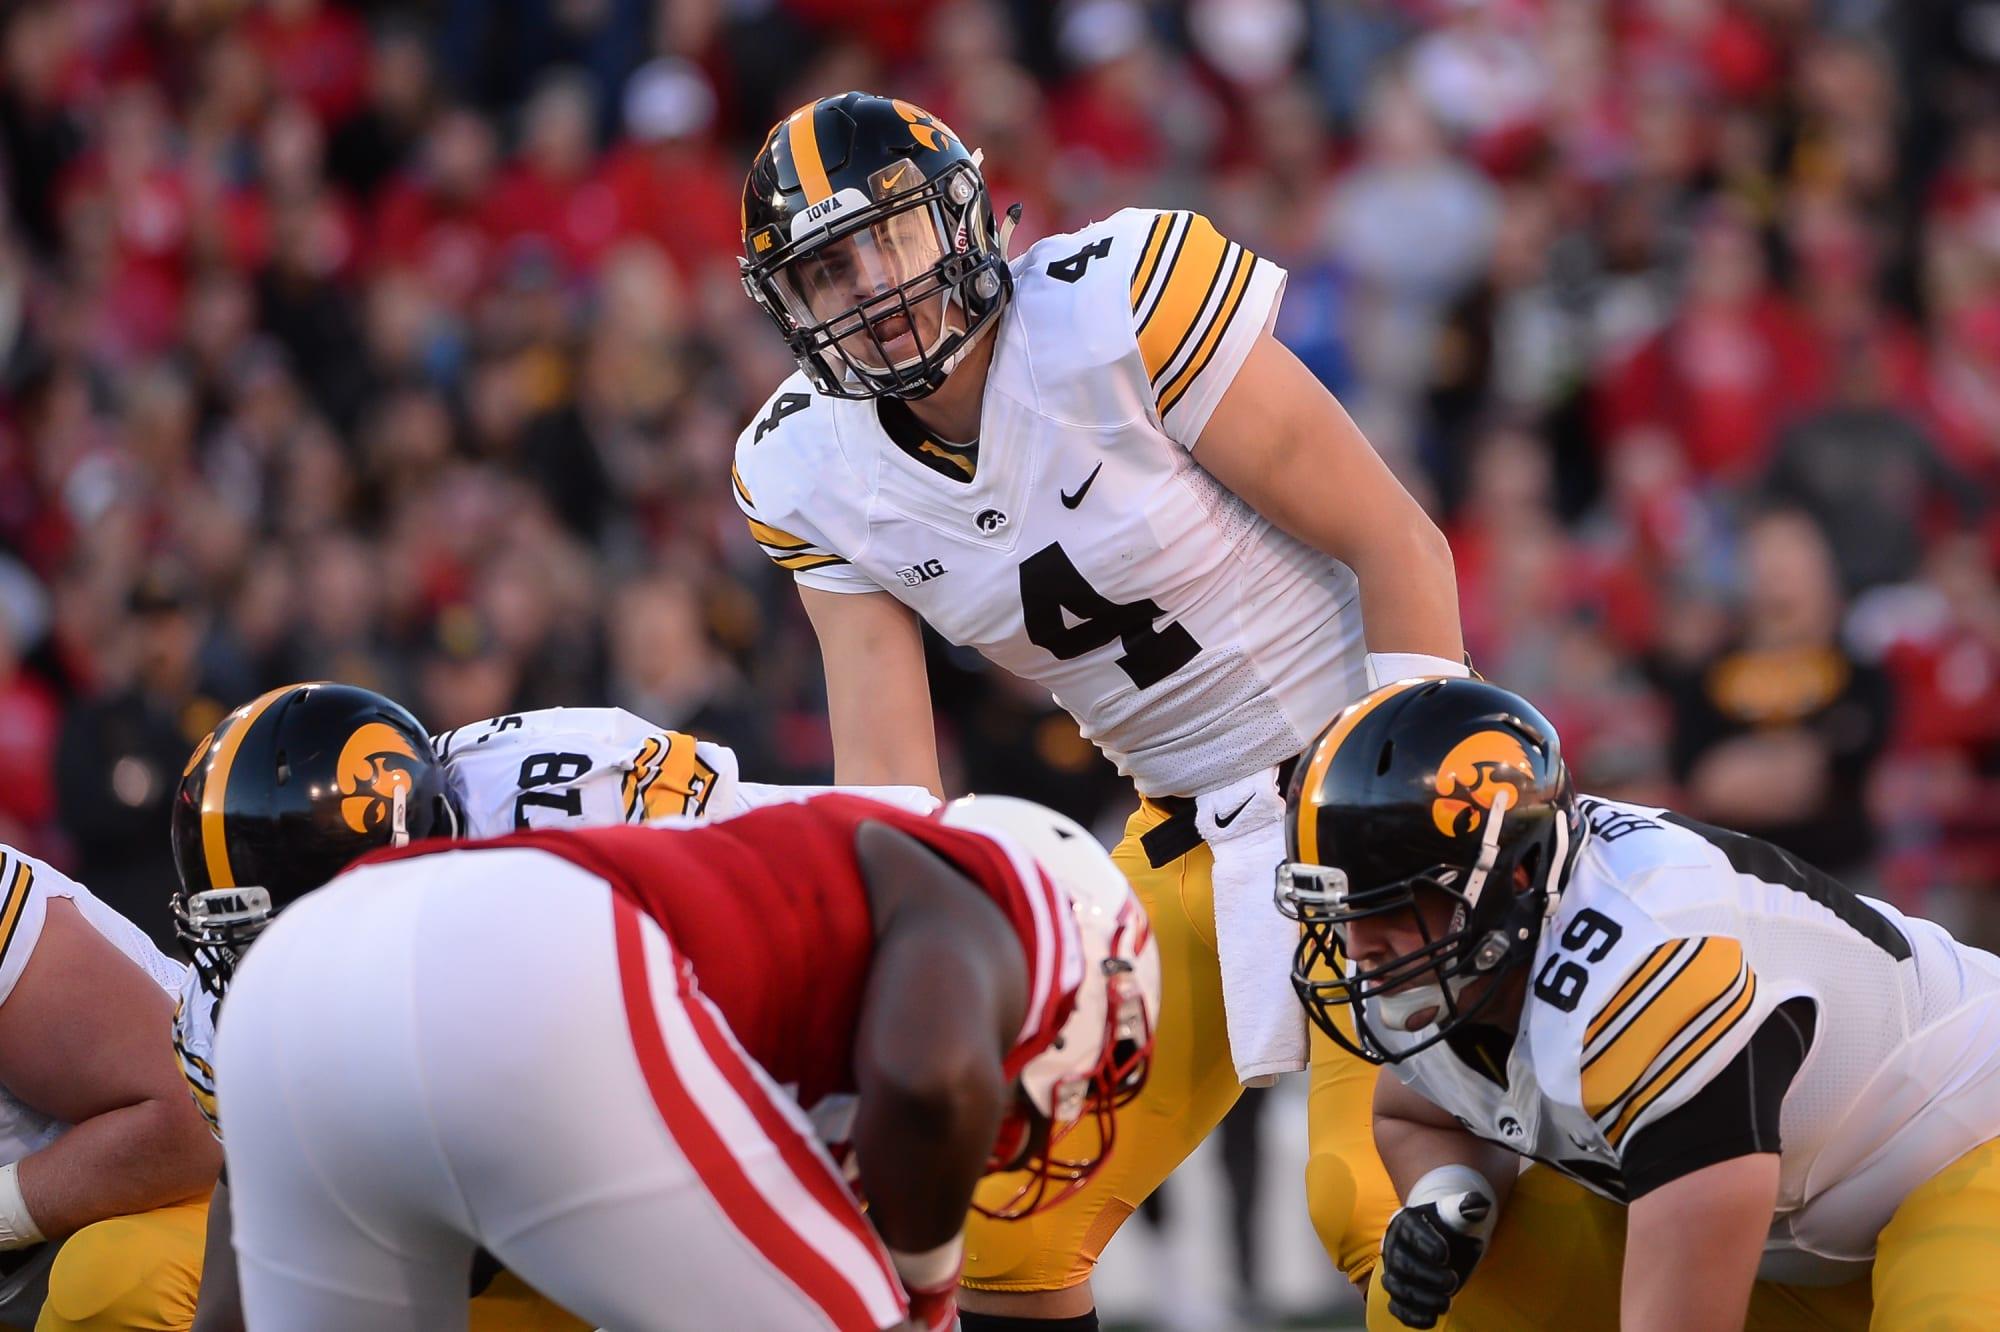 Iowa Hawkeyes versus the Nebraska Cornhuskers Game Review